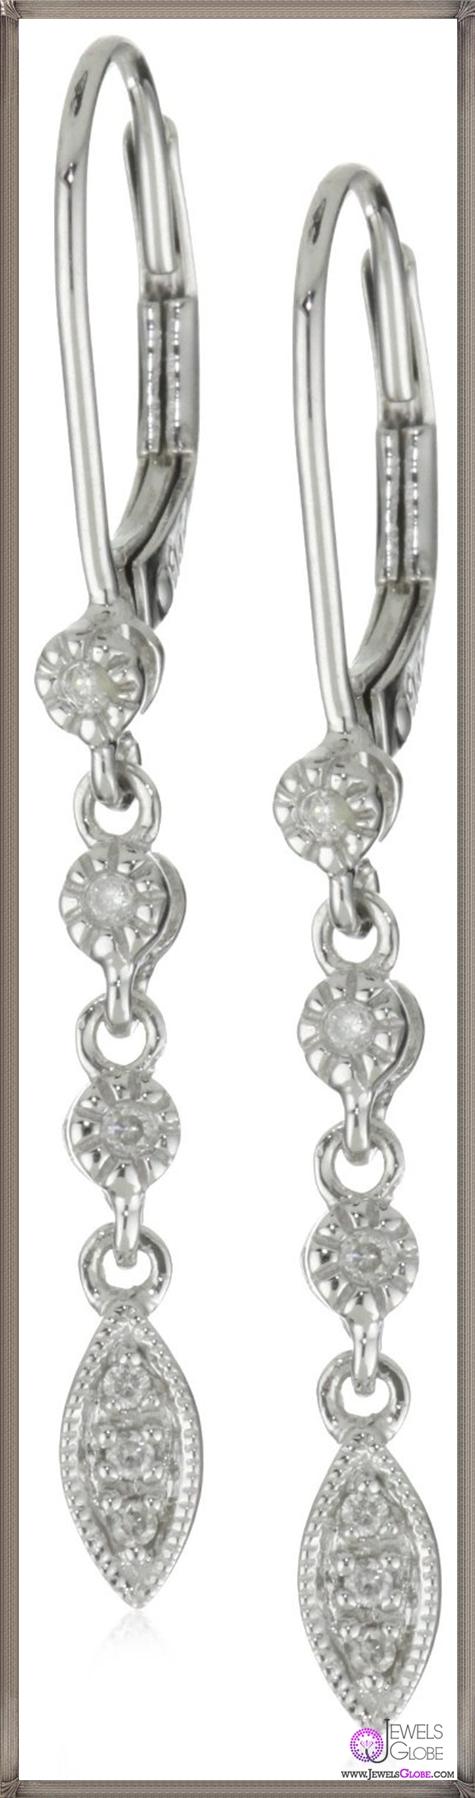 Kobelli-AMOUR-Round-Diamond-Fashion-Earrings Kobelli Jewelry and its Best STYLISH 31 Designs